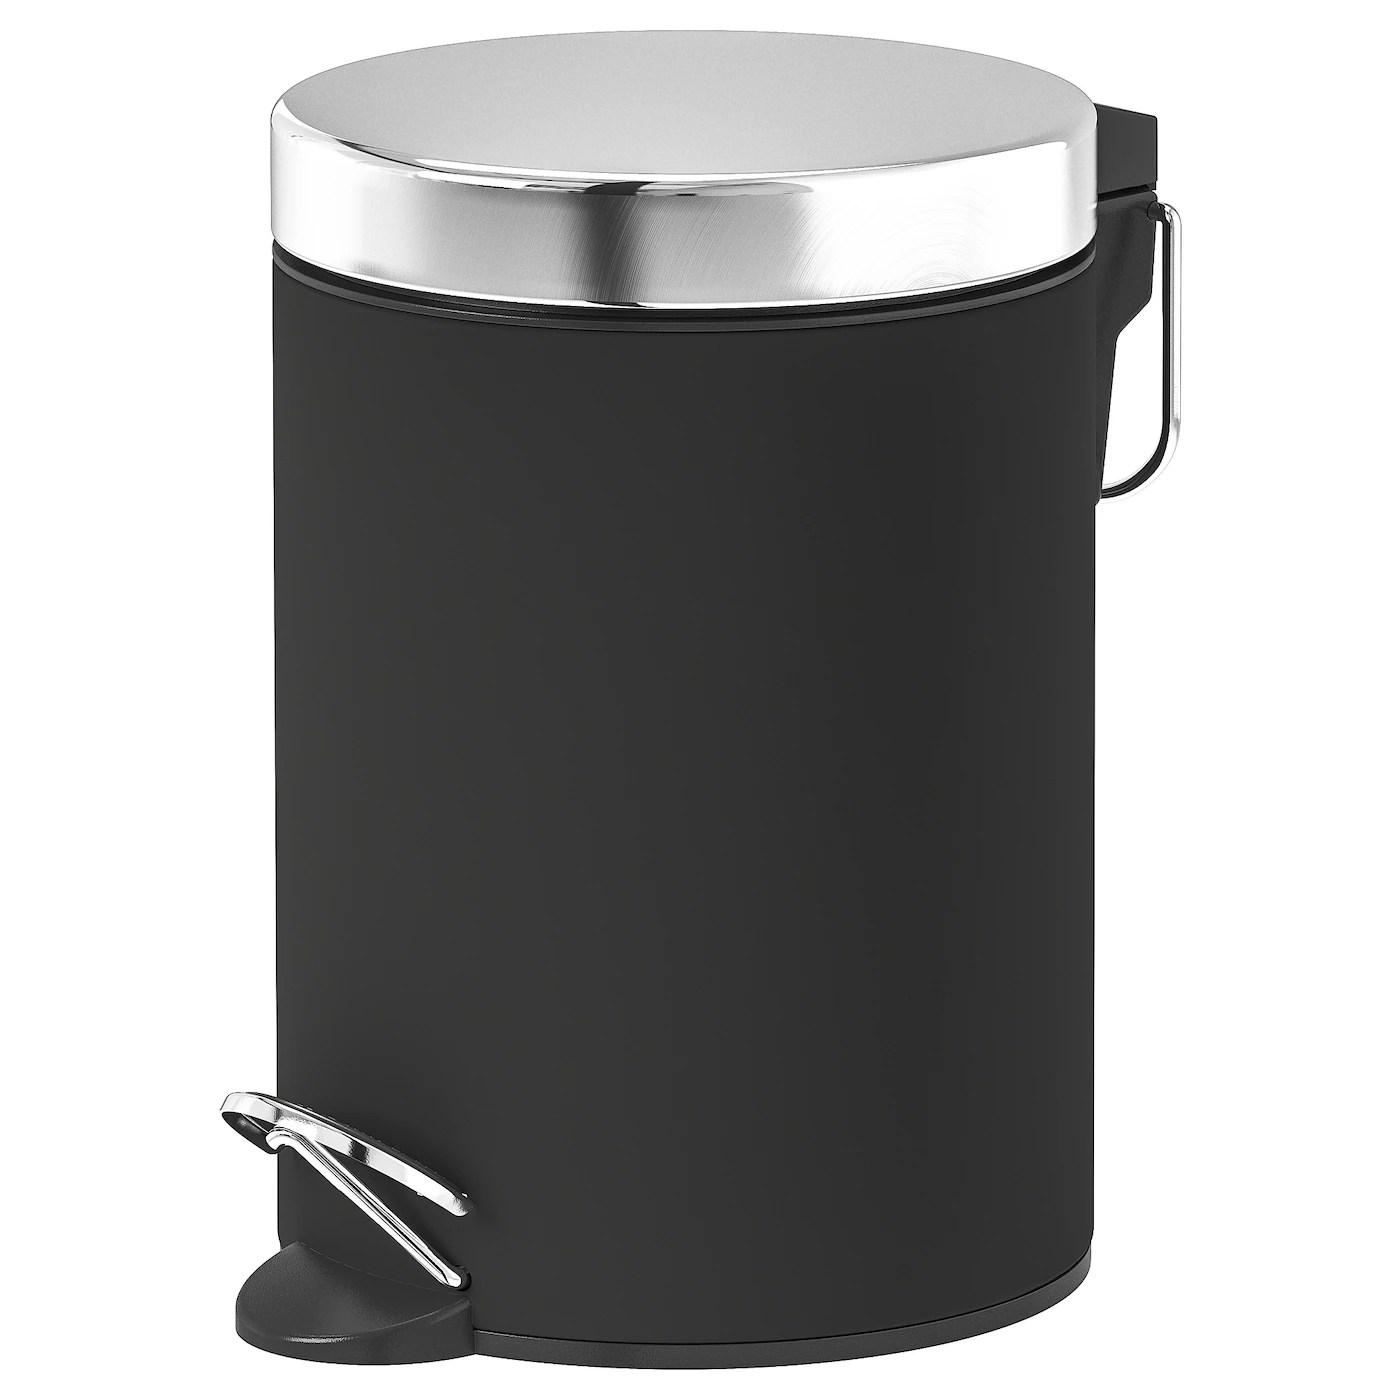 Ekoln Poubelle Gris Fonce Ikea